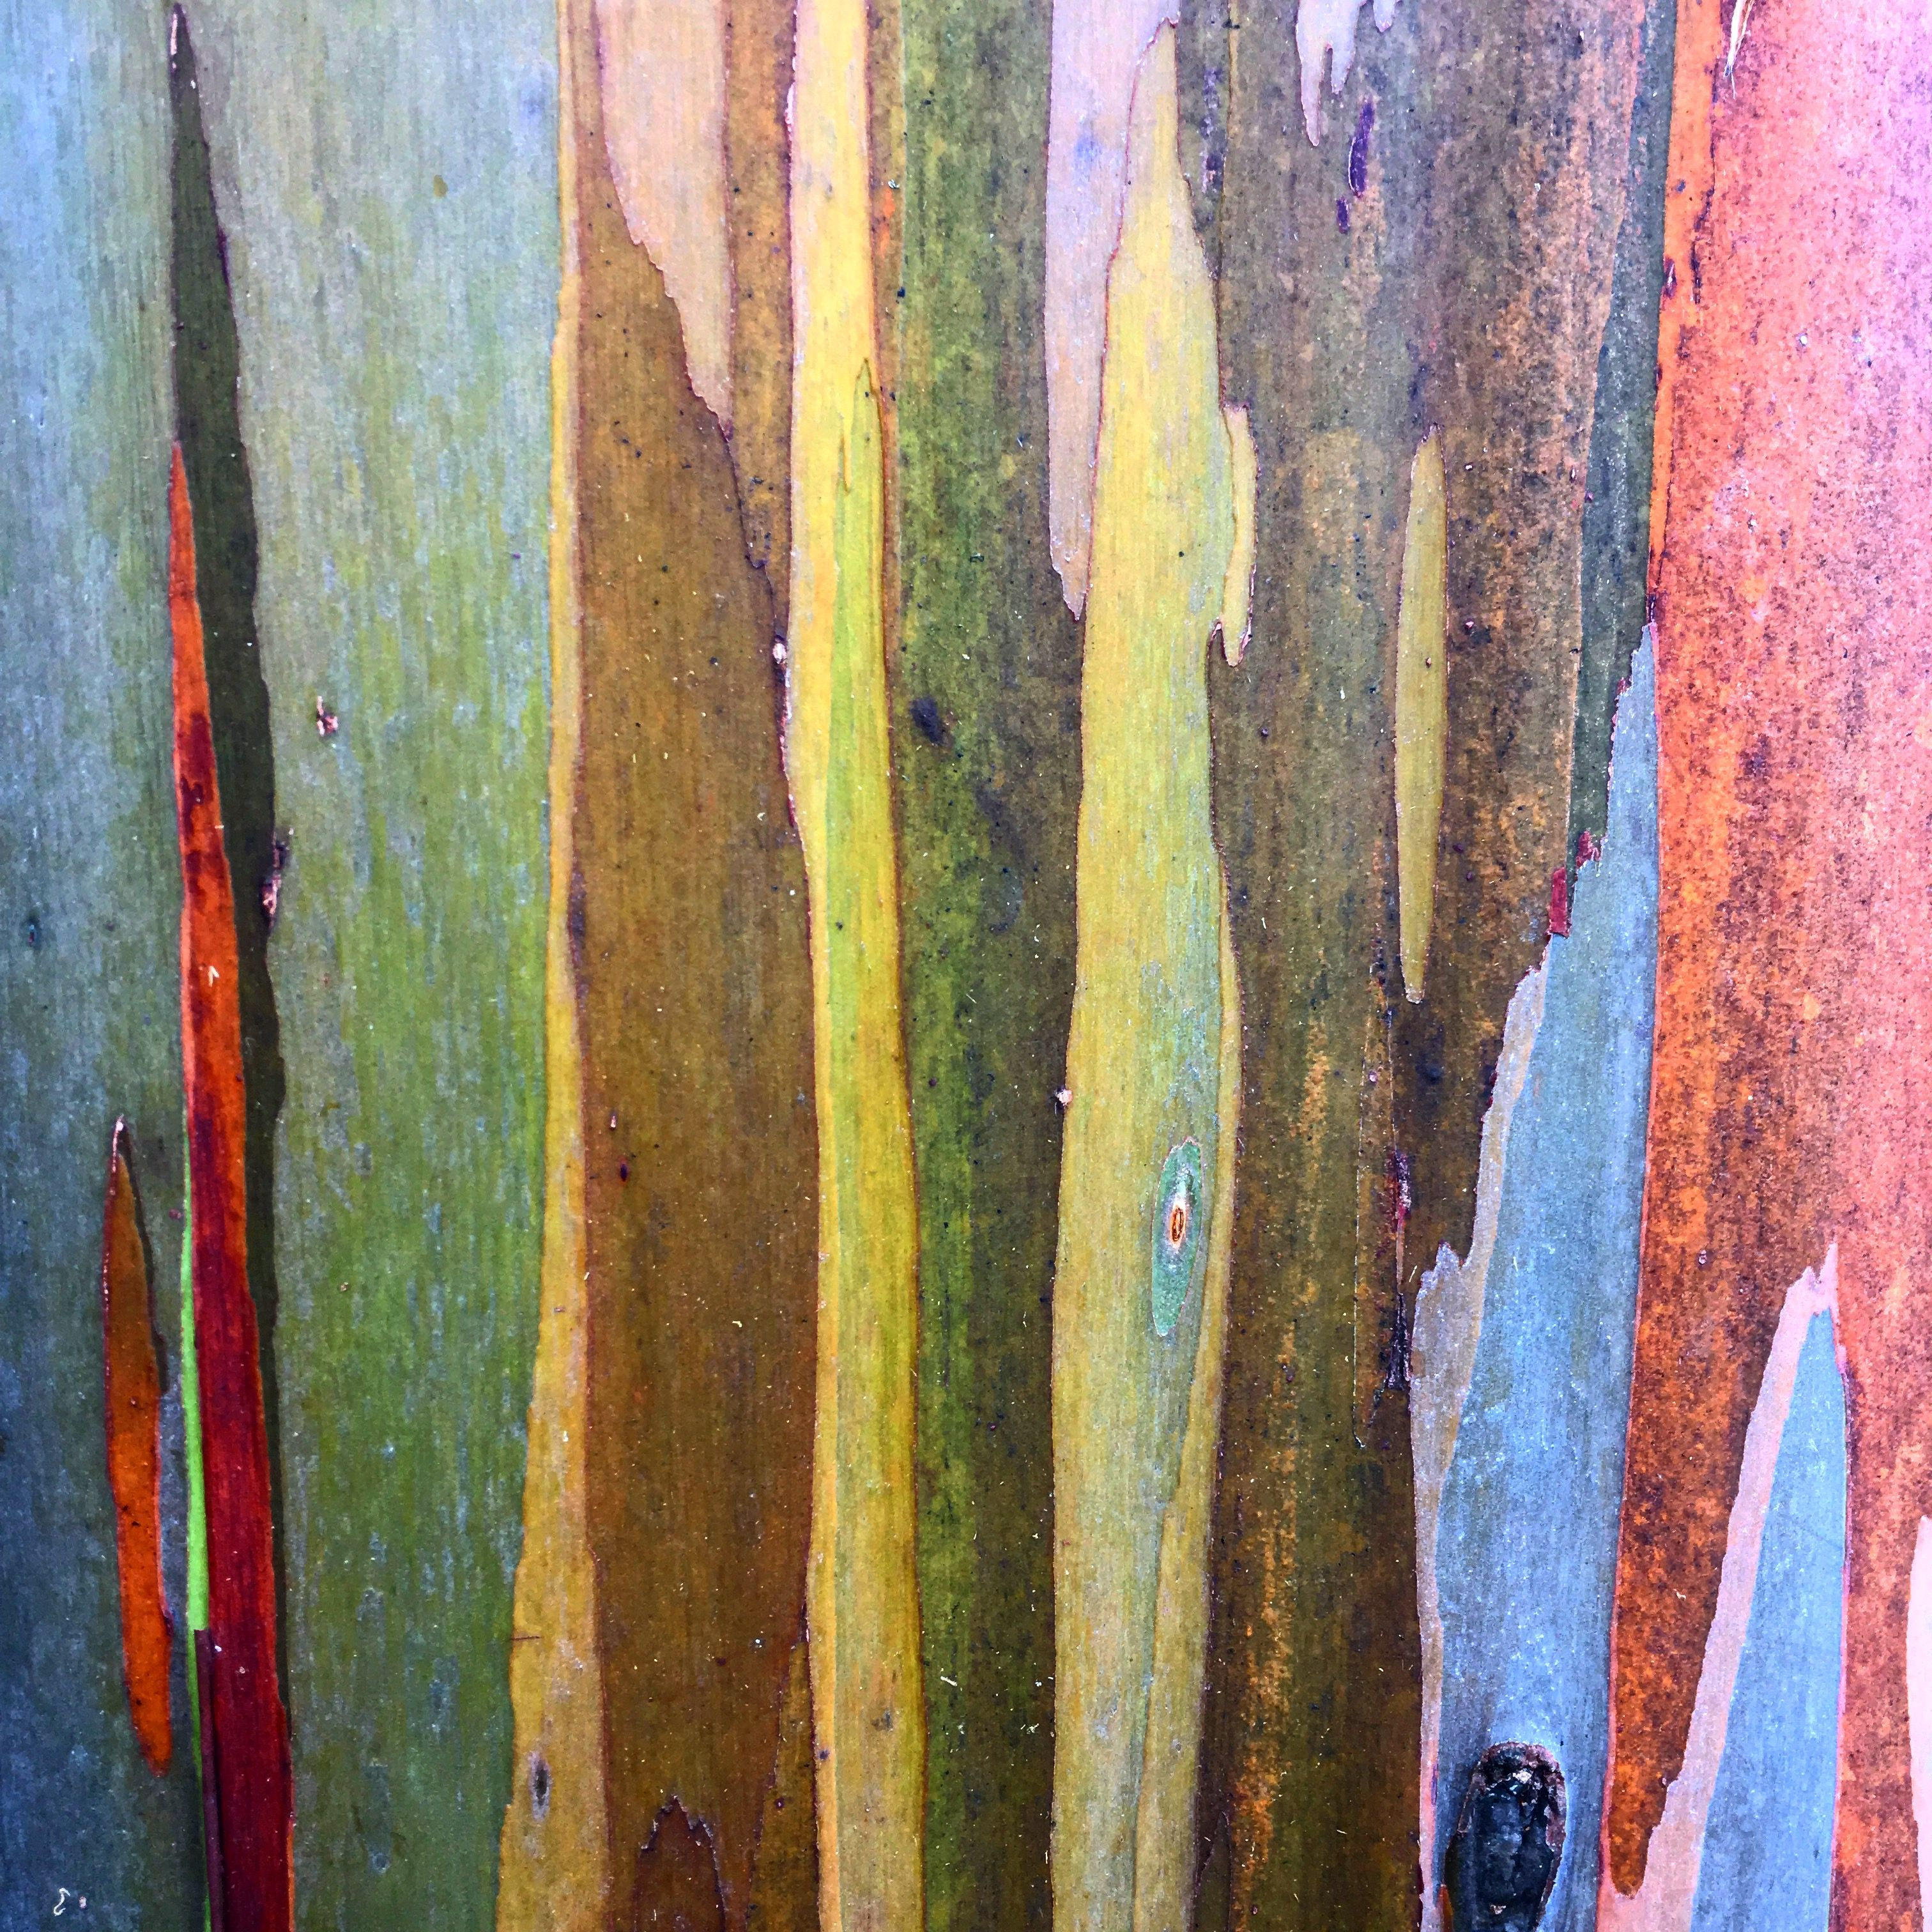 Rainbow eucalyptus tree bark from Kauai Visit paintedbarkgallery